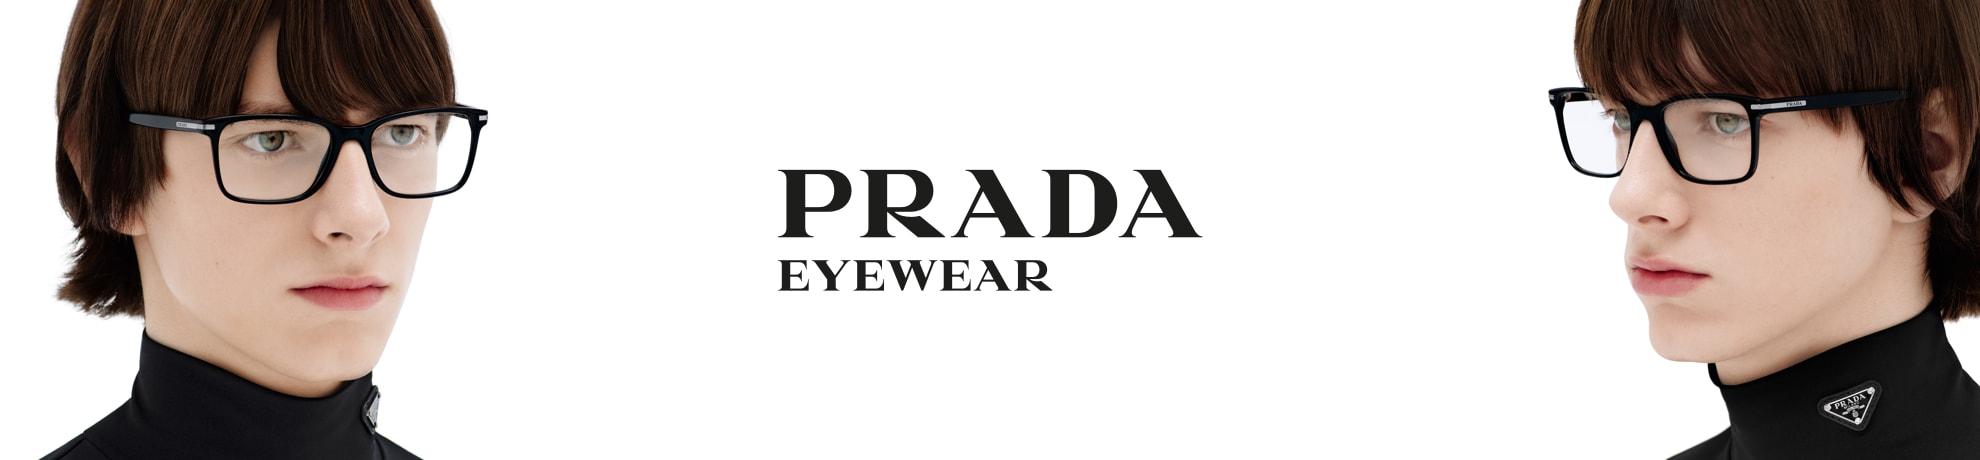 Prada plp banner image